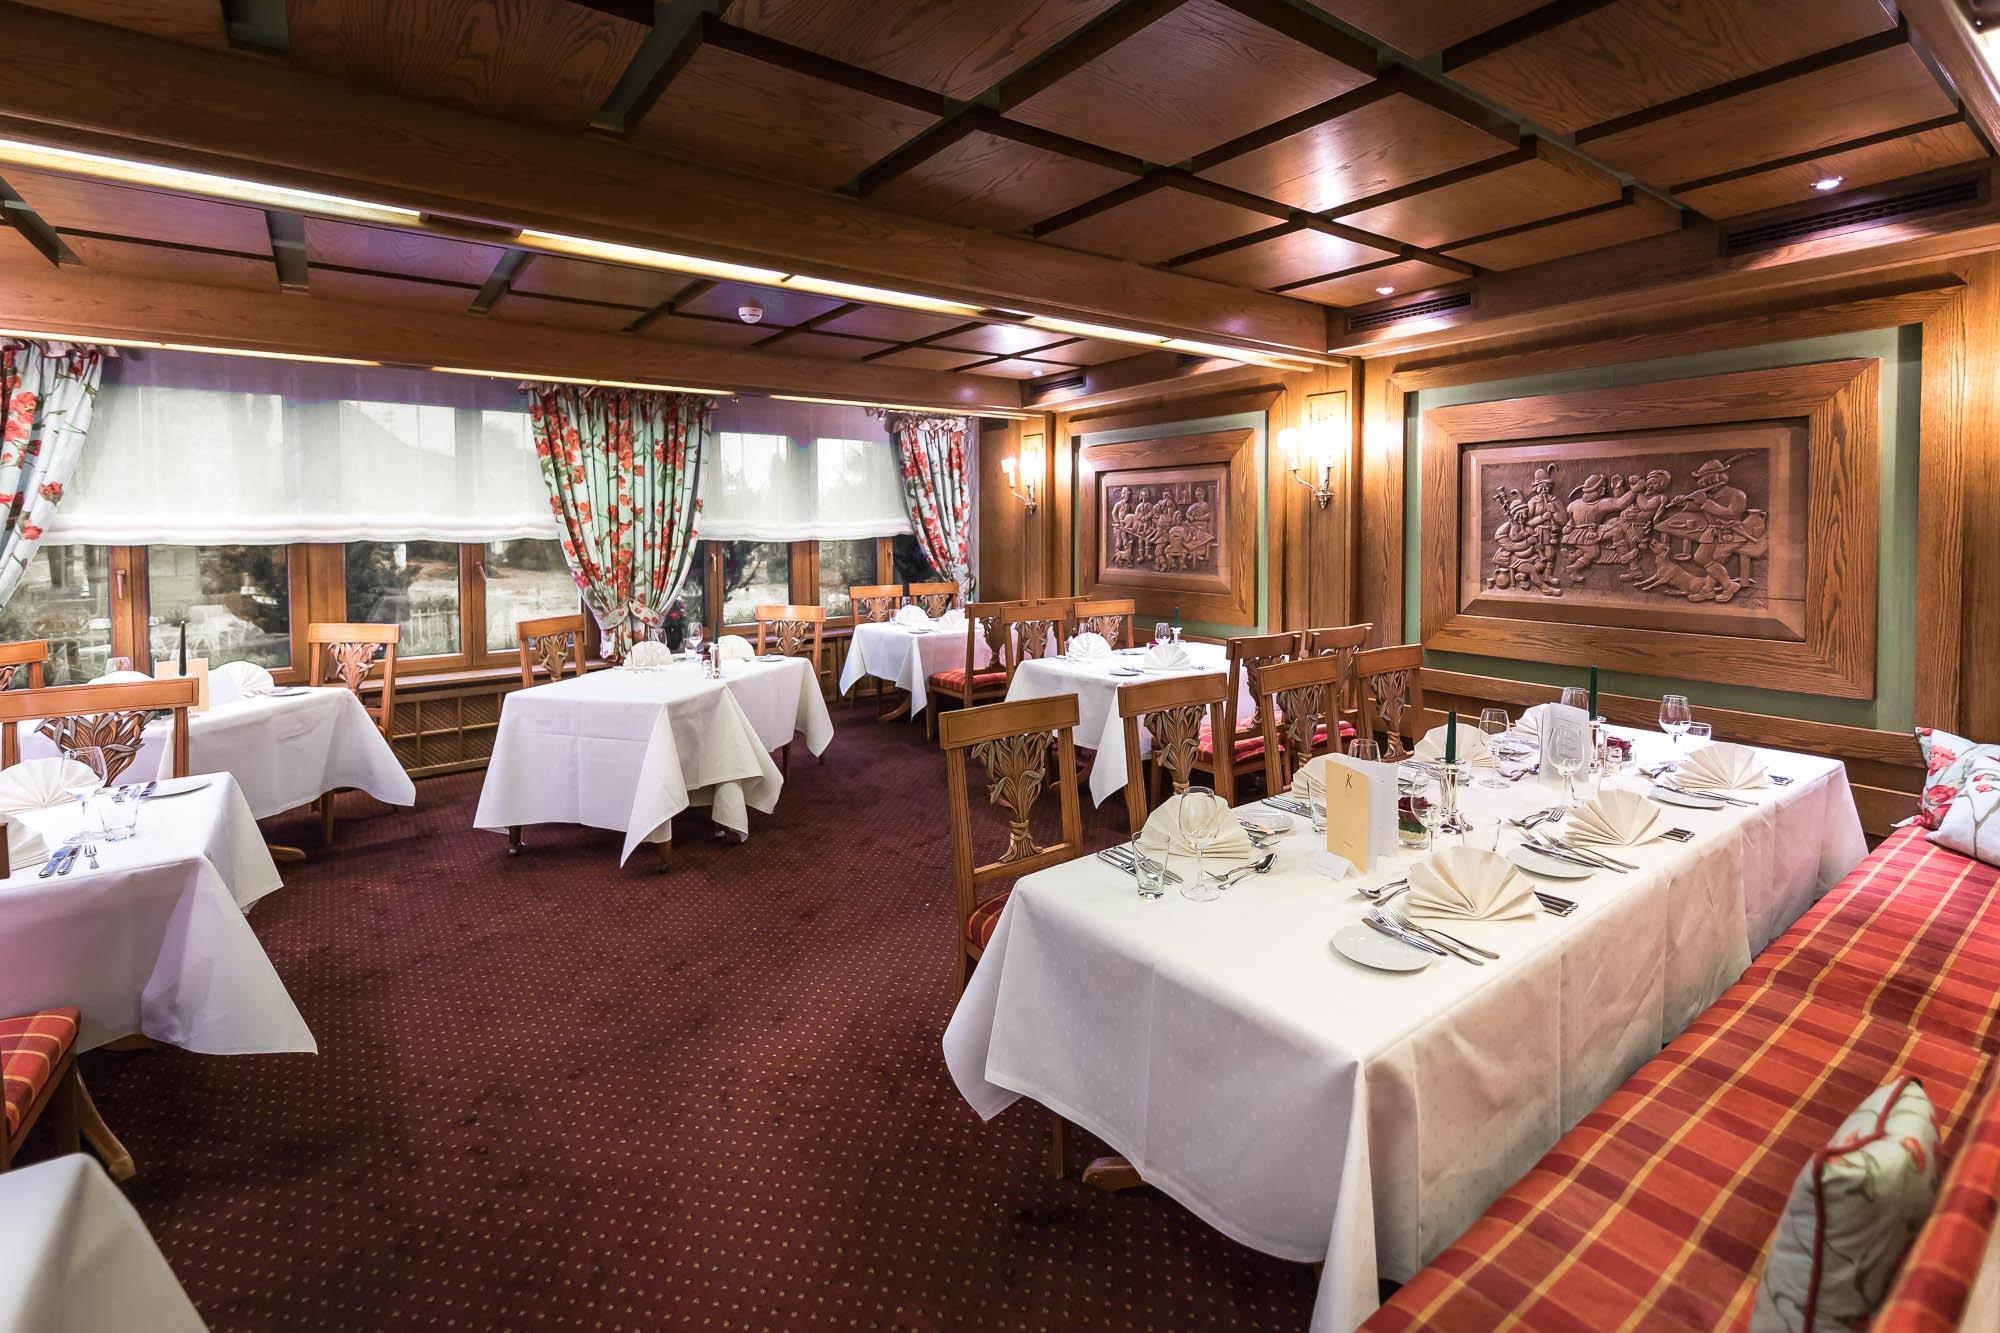 Hotel Kunz kulinarik restaurant hotel restaurant kunz